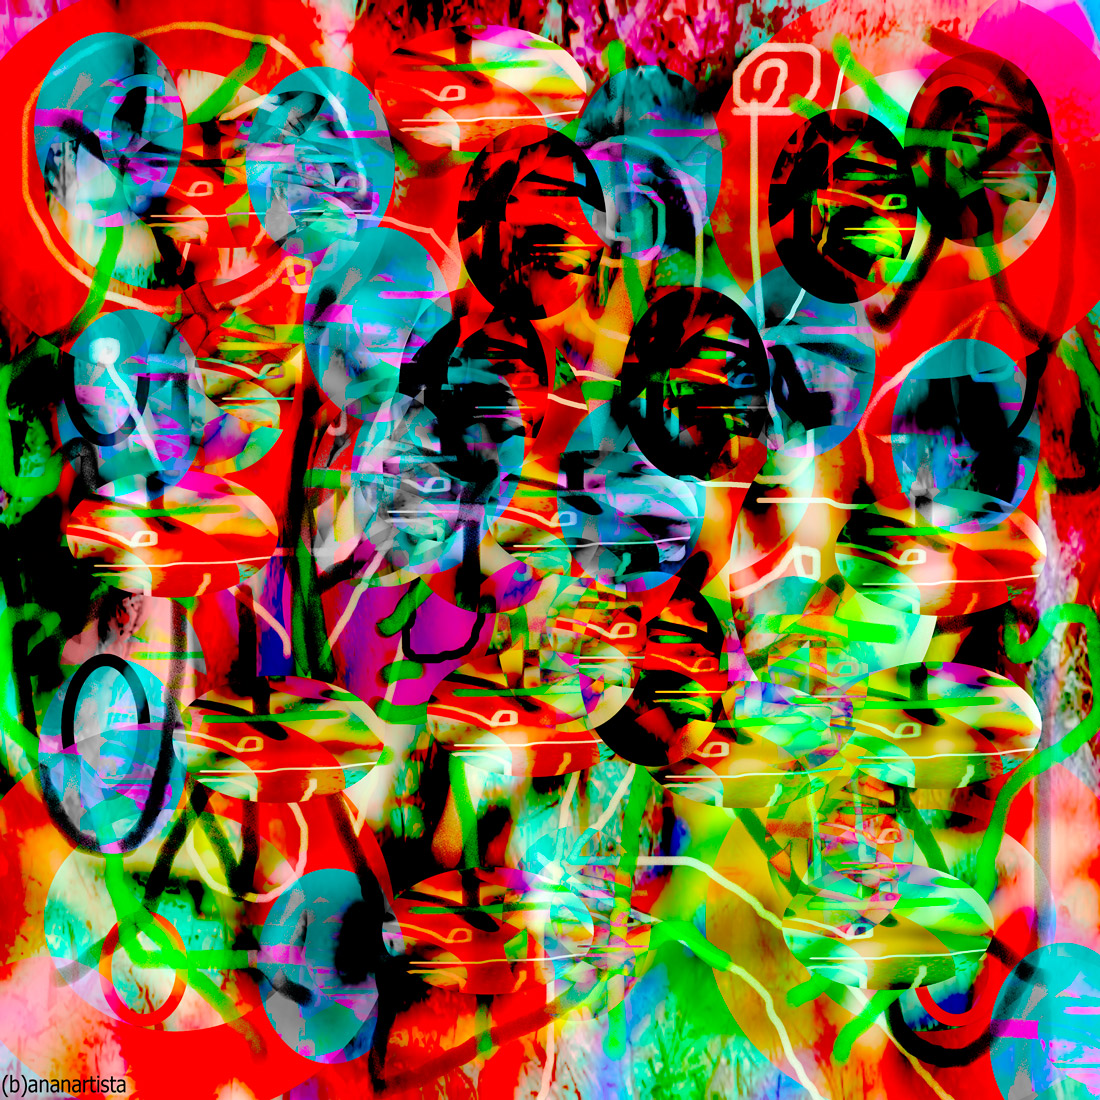 squirrel - digital abstract art by (b)ananartista sbuff